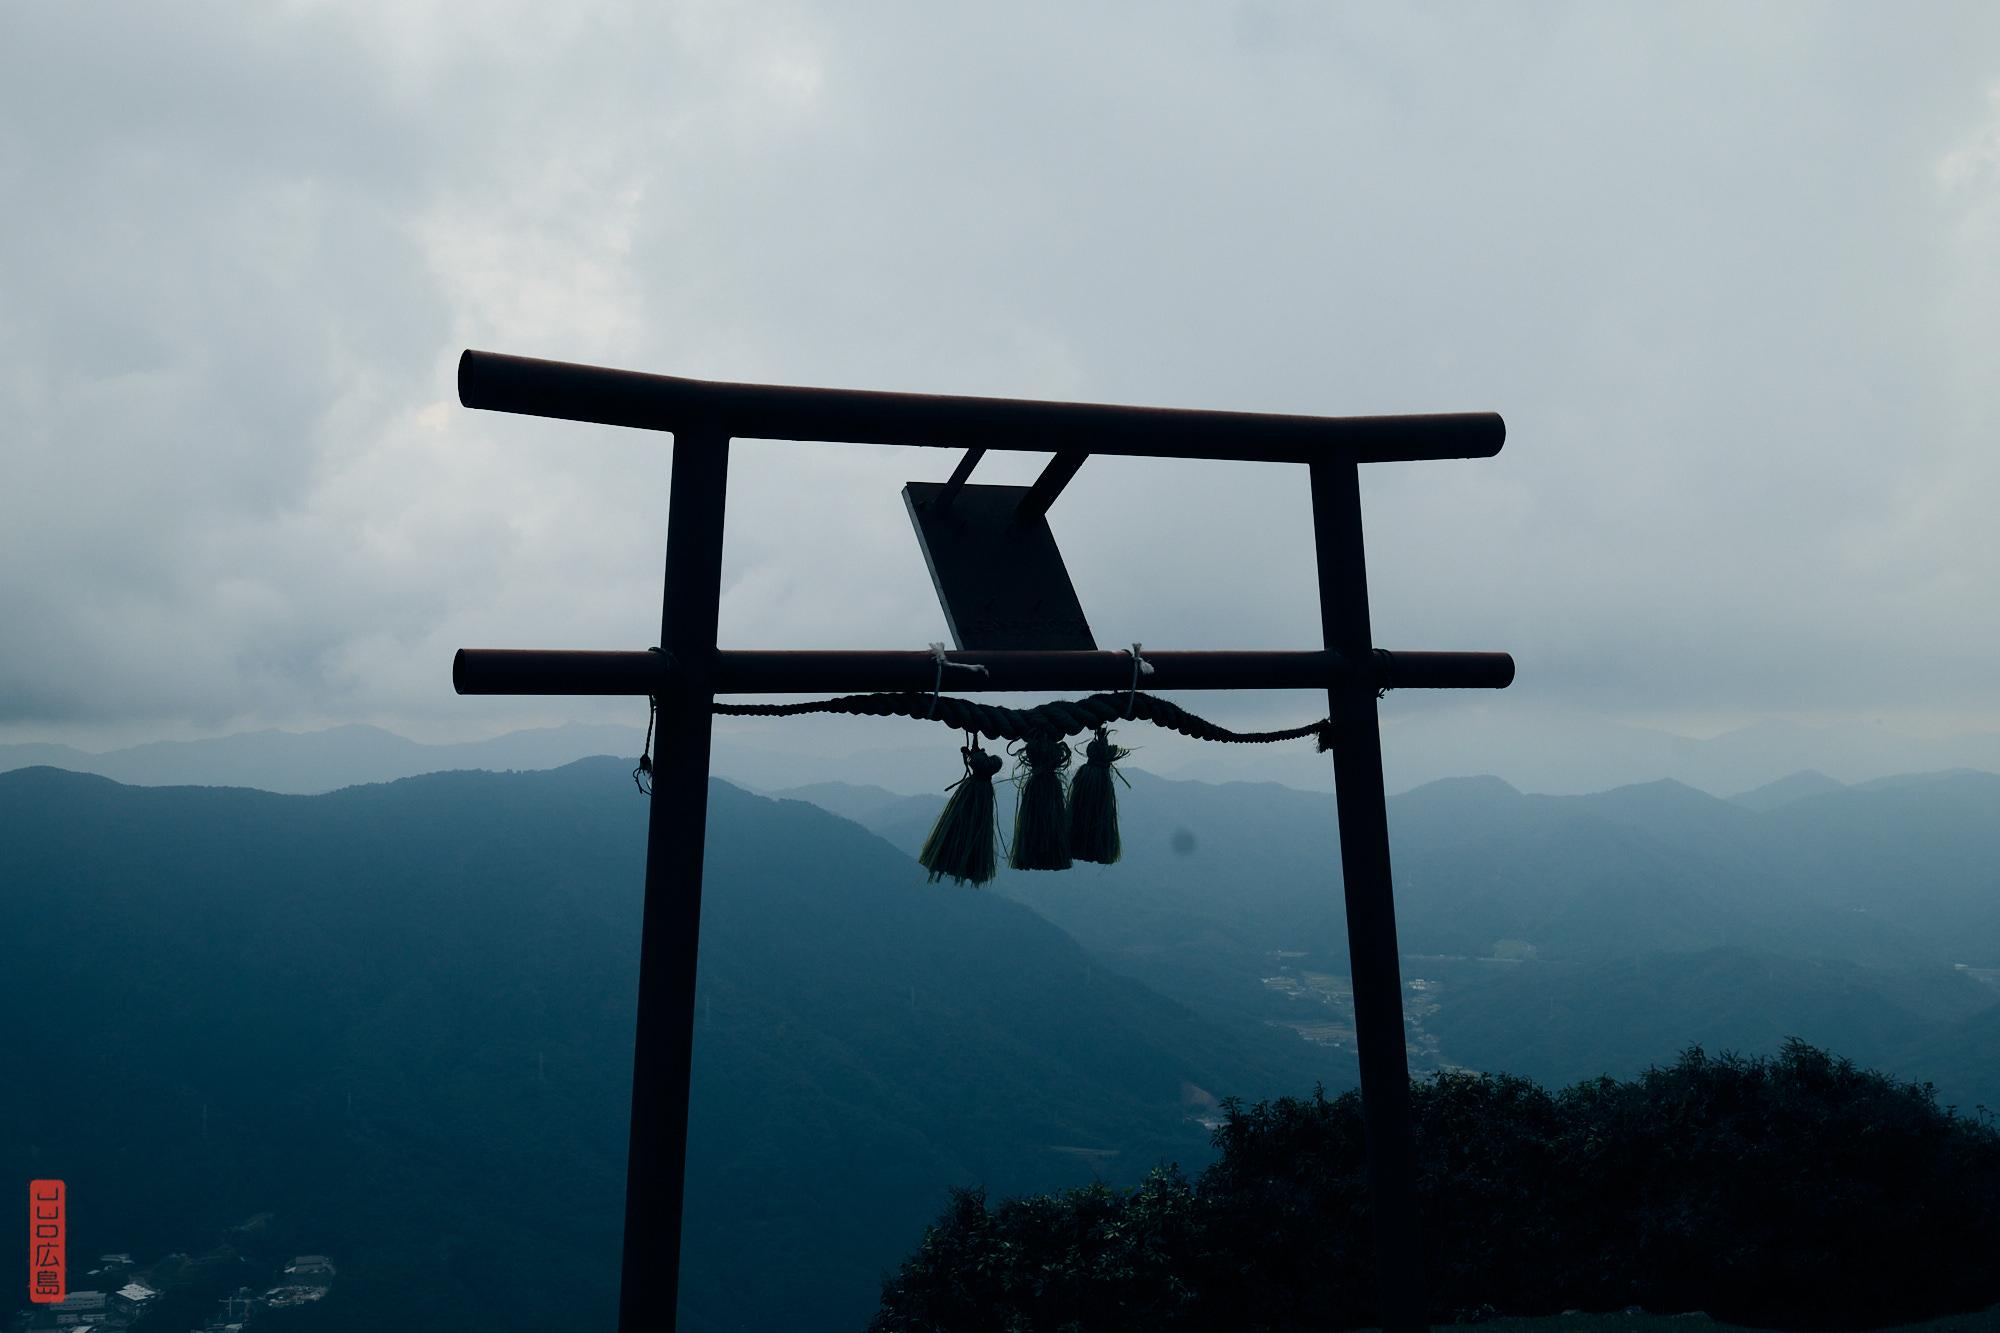 Sommet du mont Shirakiyama, Hiroshima, torii